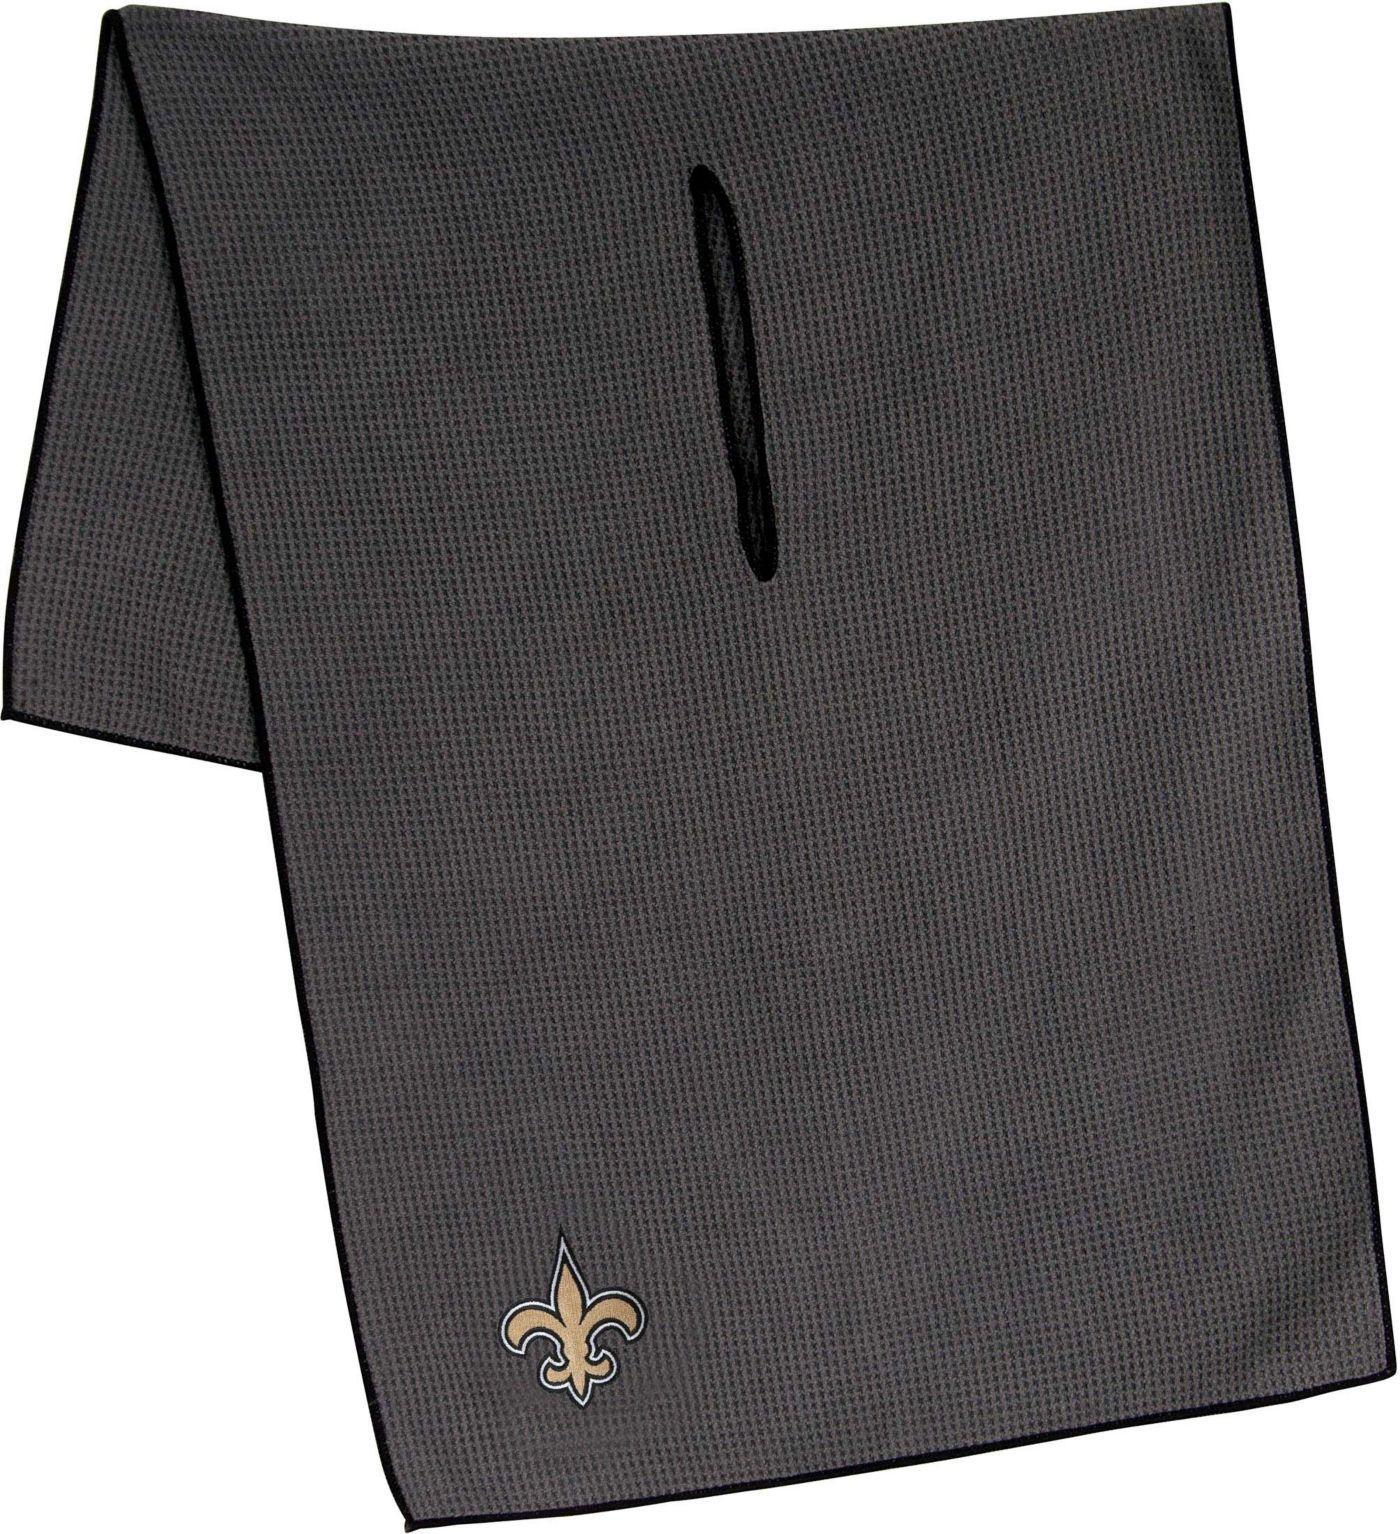 "Team Effort New Orleans Saints 19"" x 41"" Microfiber Golf Towel"